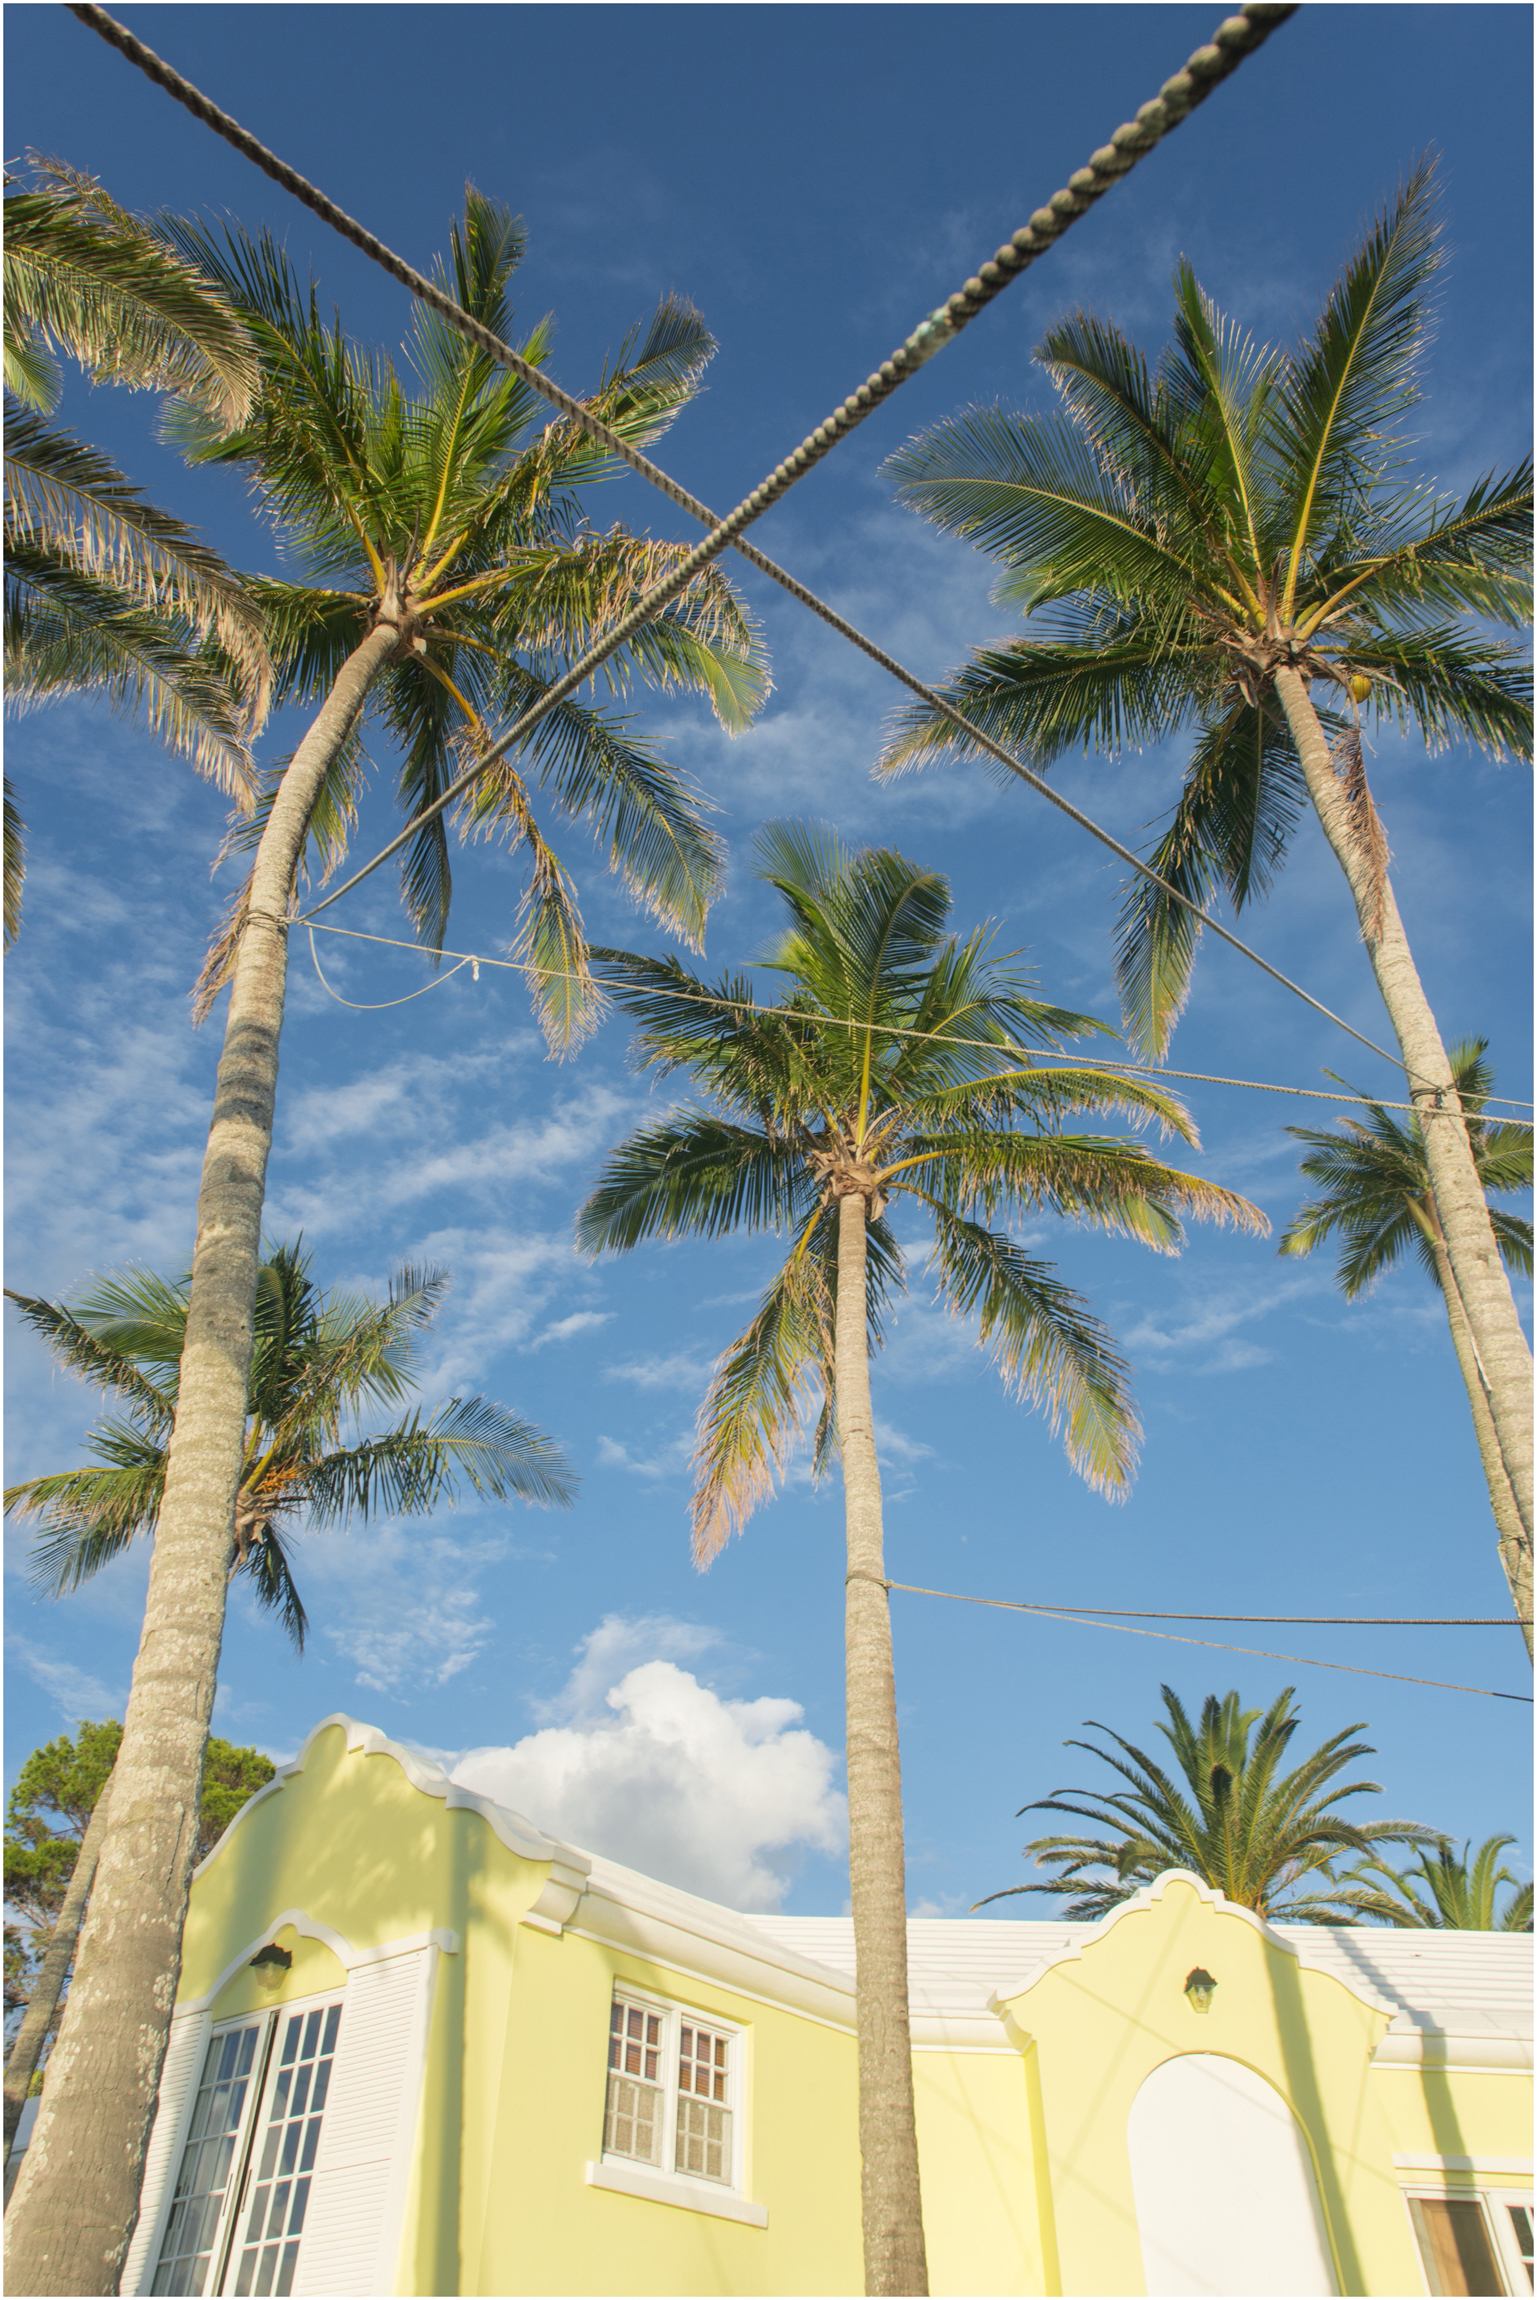 ©FianderFoto_Architecture_Bermuda_Palomera_021.jpg